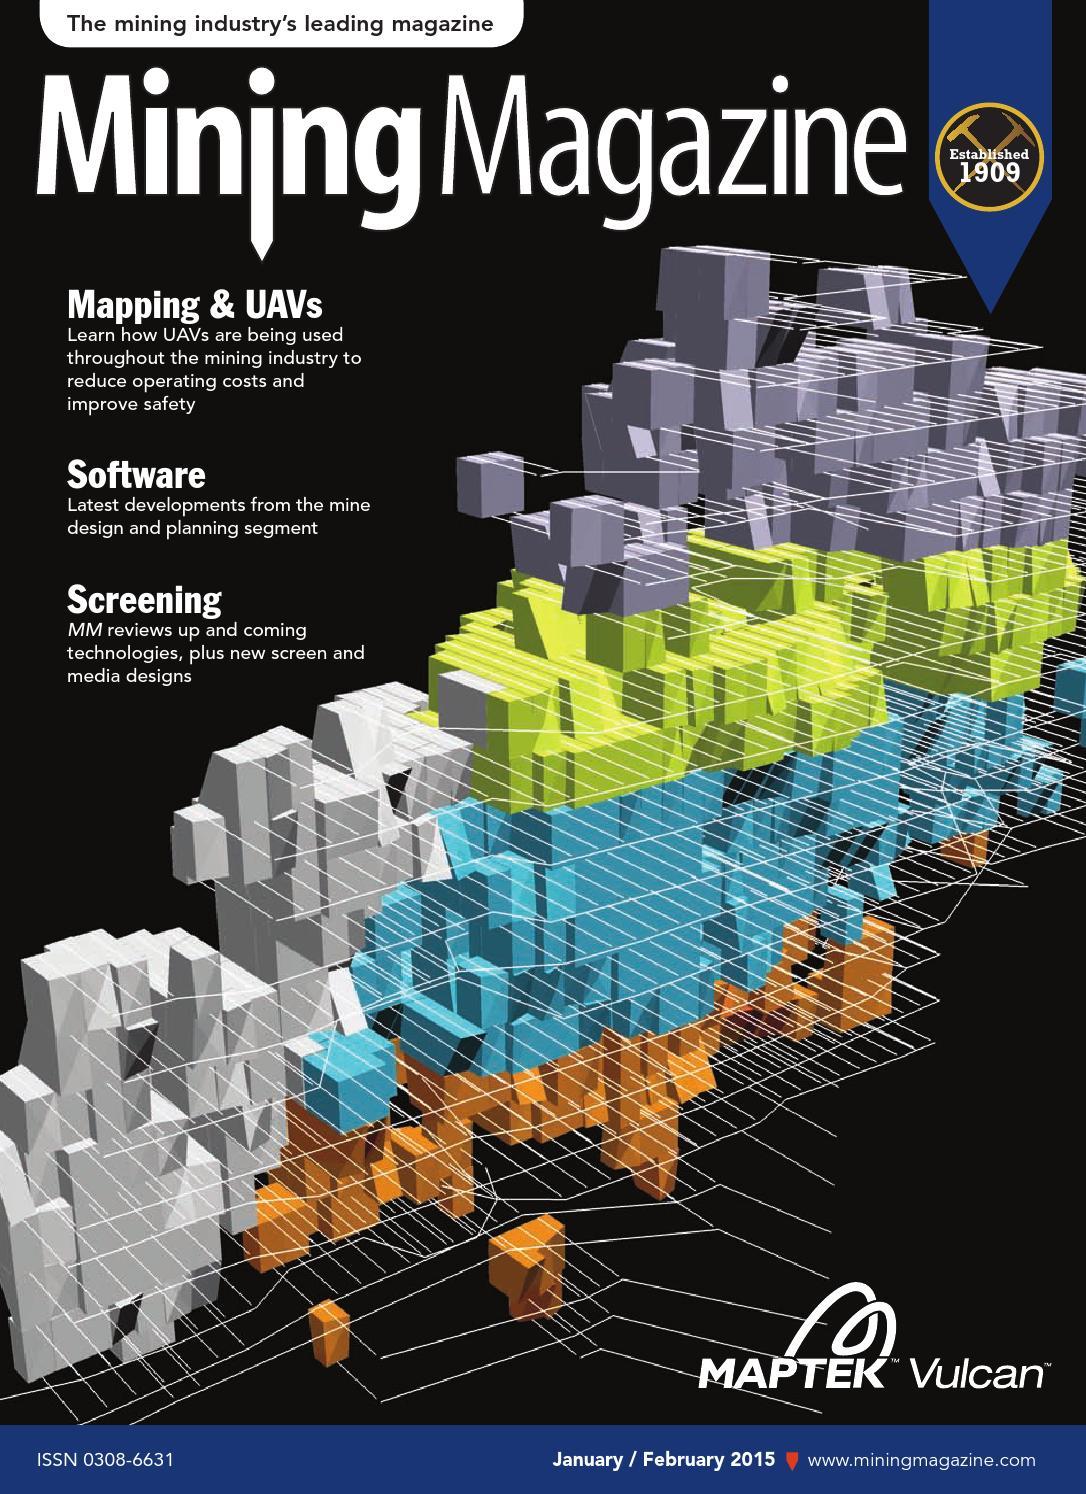 Mining Magazine January/February 2015 by Webmaster Aspermont Media - issuu